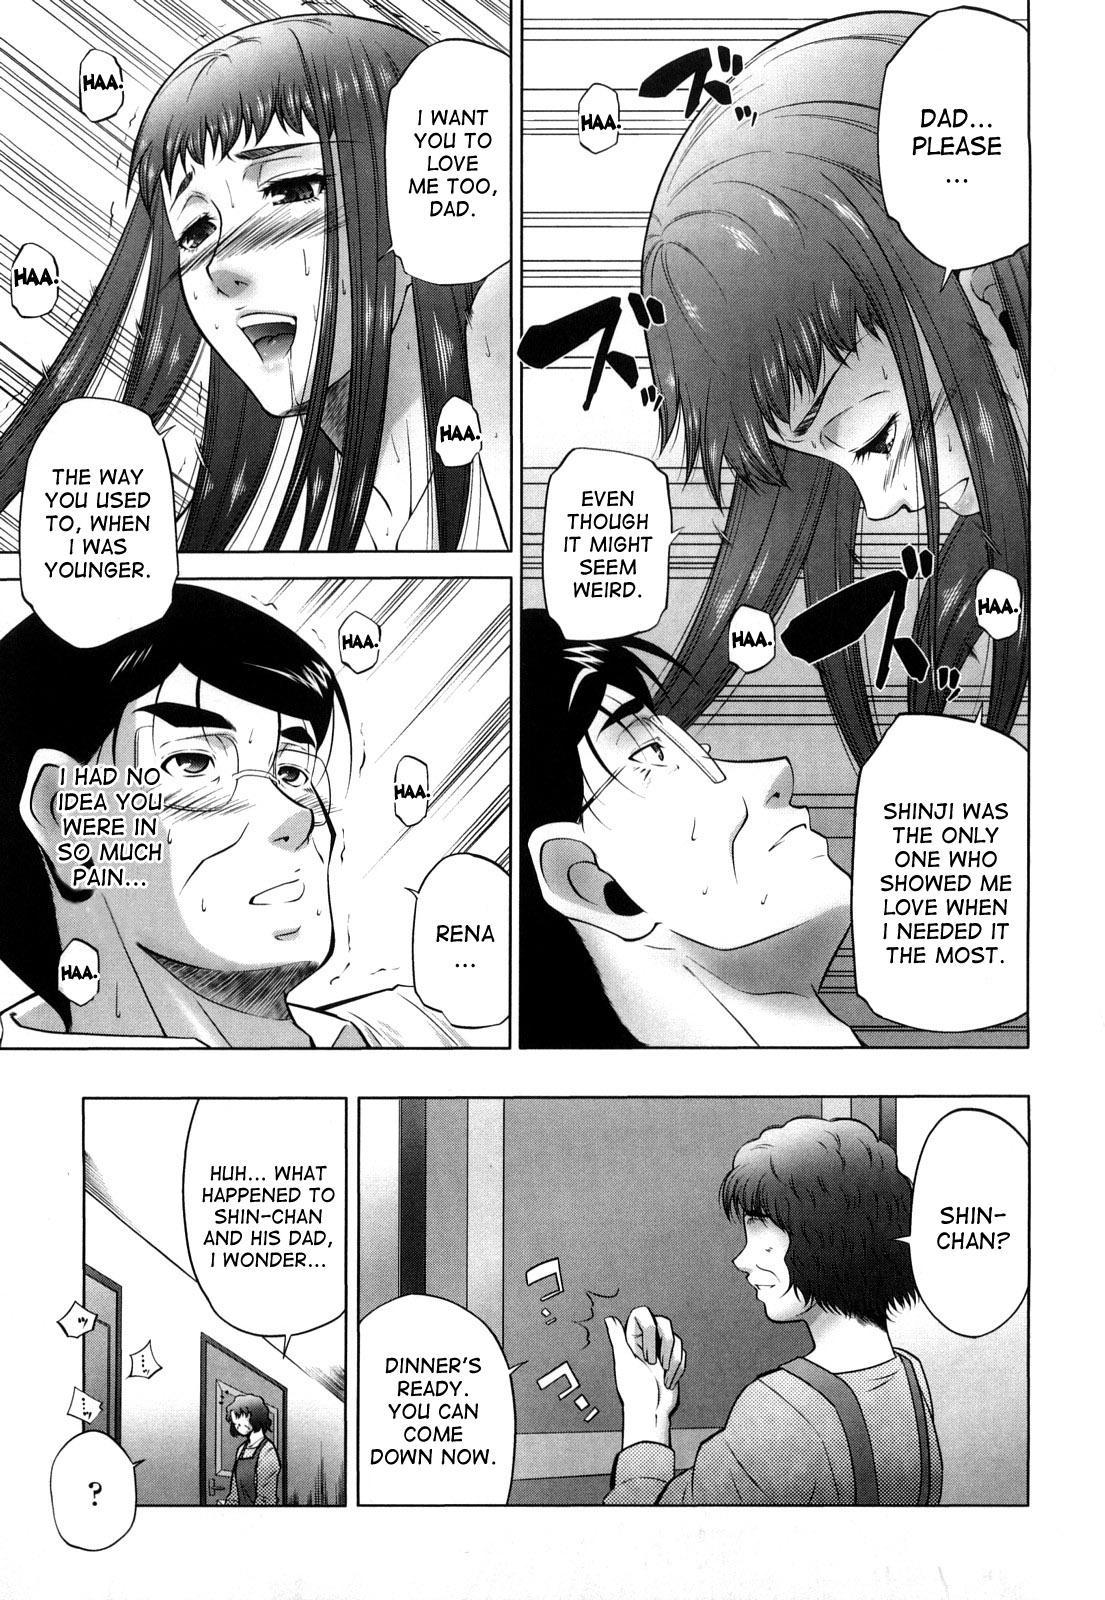 [Touma Itsuki] Ane-sama Inkou - Sister's Sexy Smell [English] {desudesu} 180